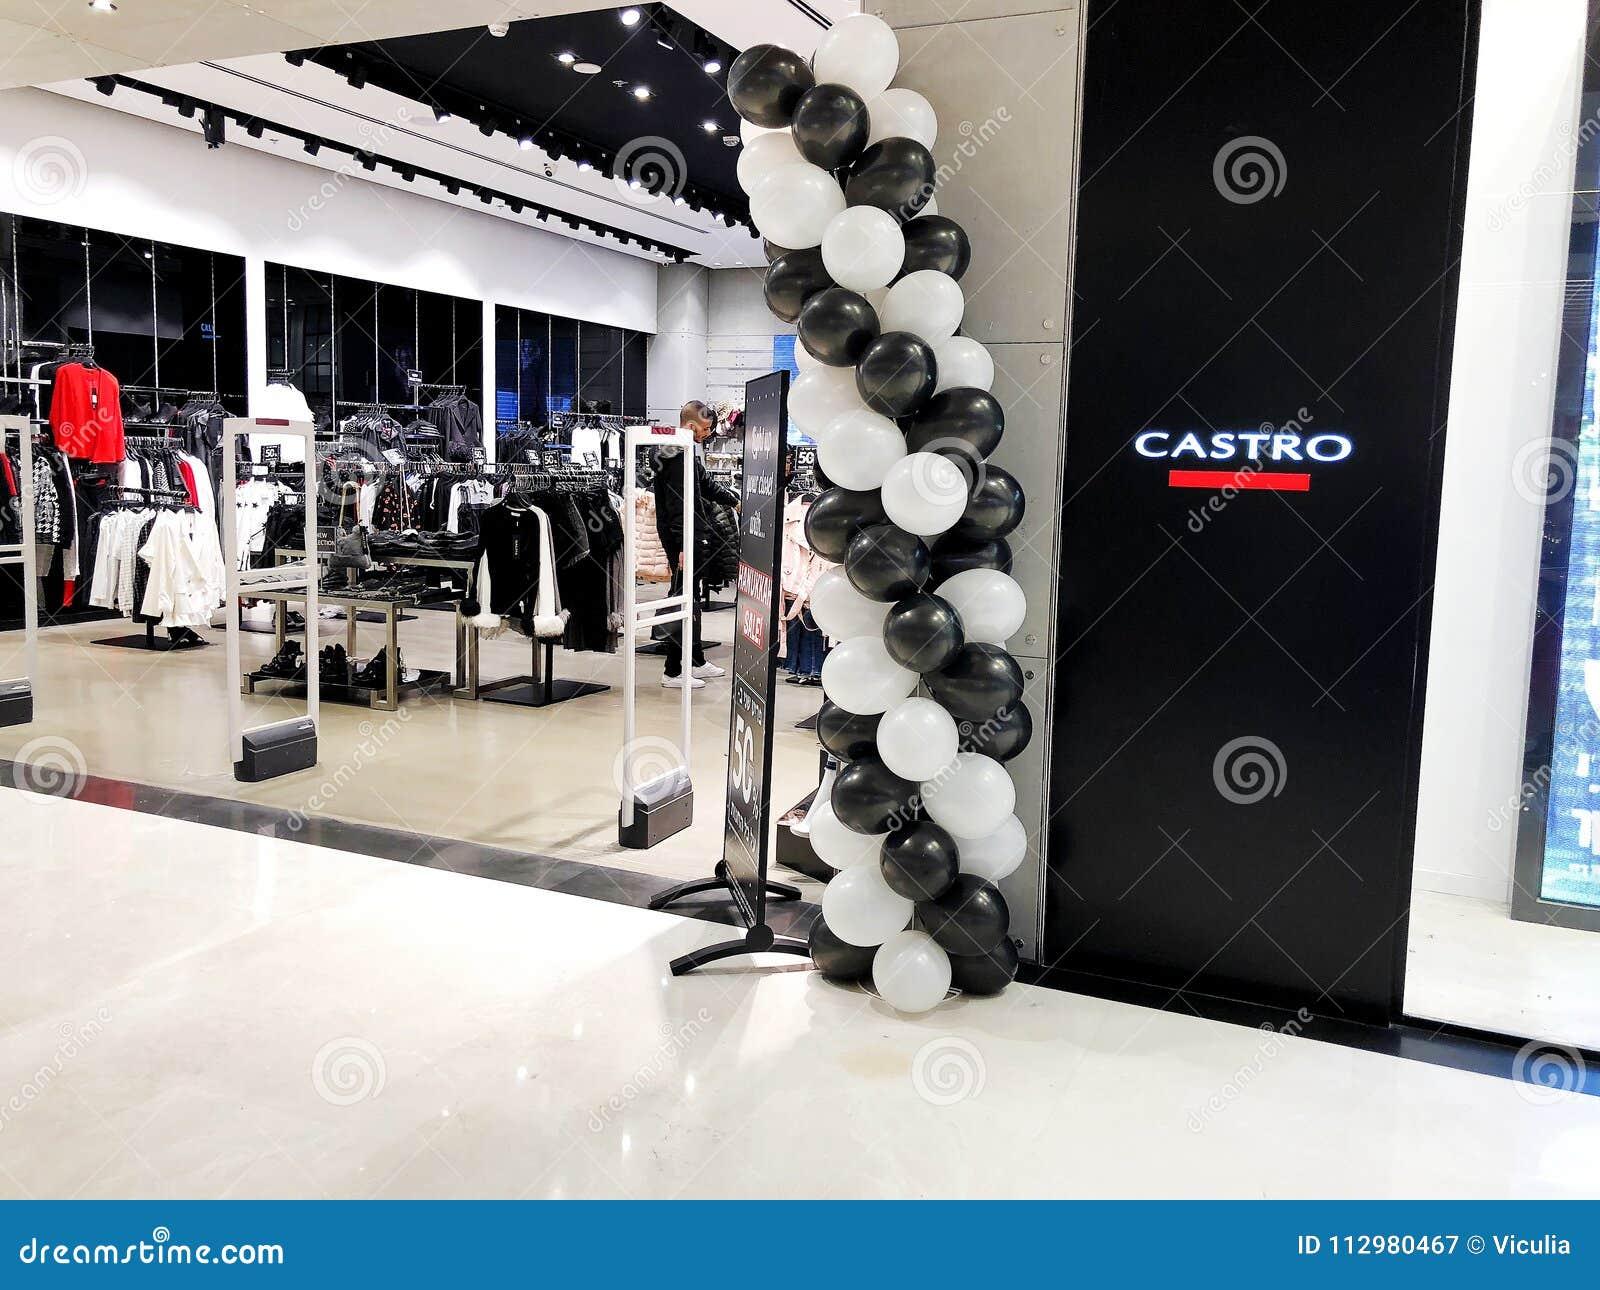 RISHON LE ZION, ISRAEL- DECEMBER 17, 2017: Inside the store at Azrieli Department Store in Rishon Le Zion, Israel